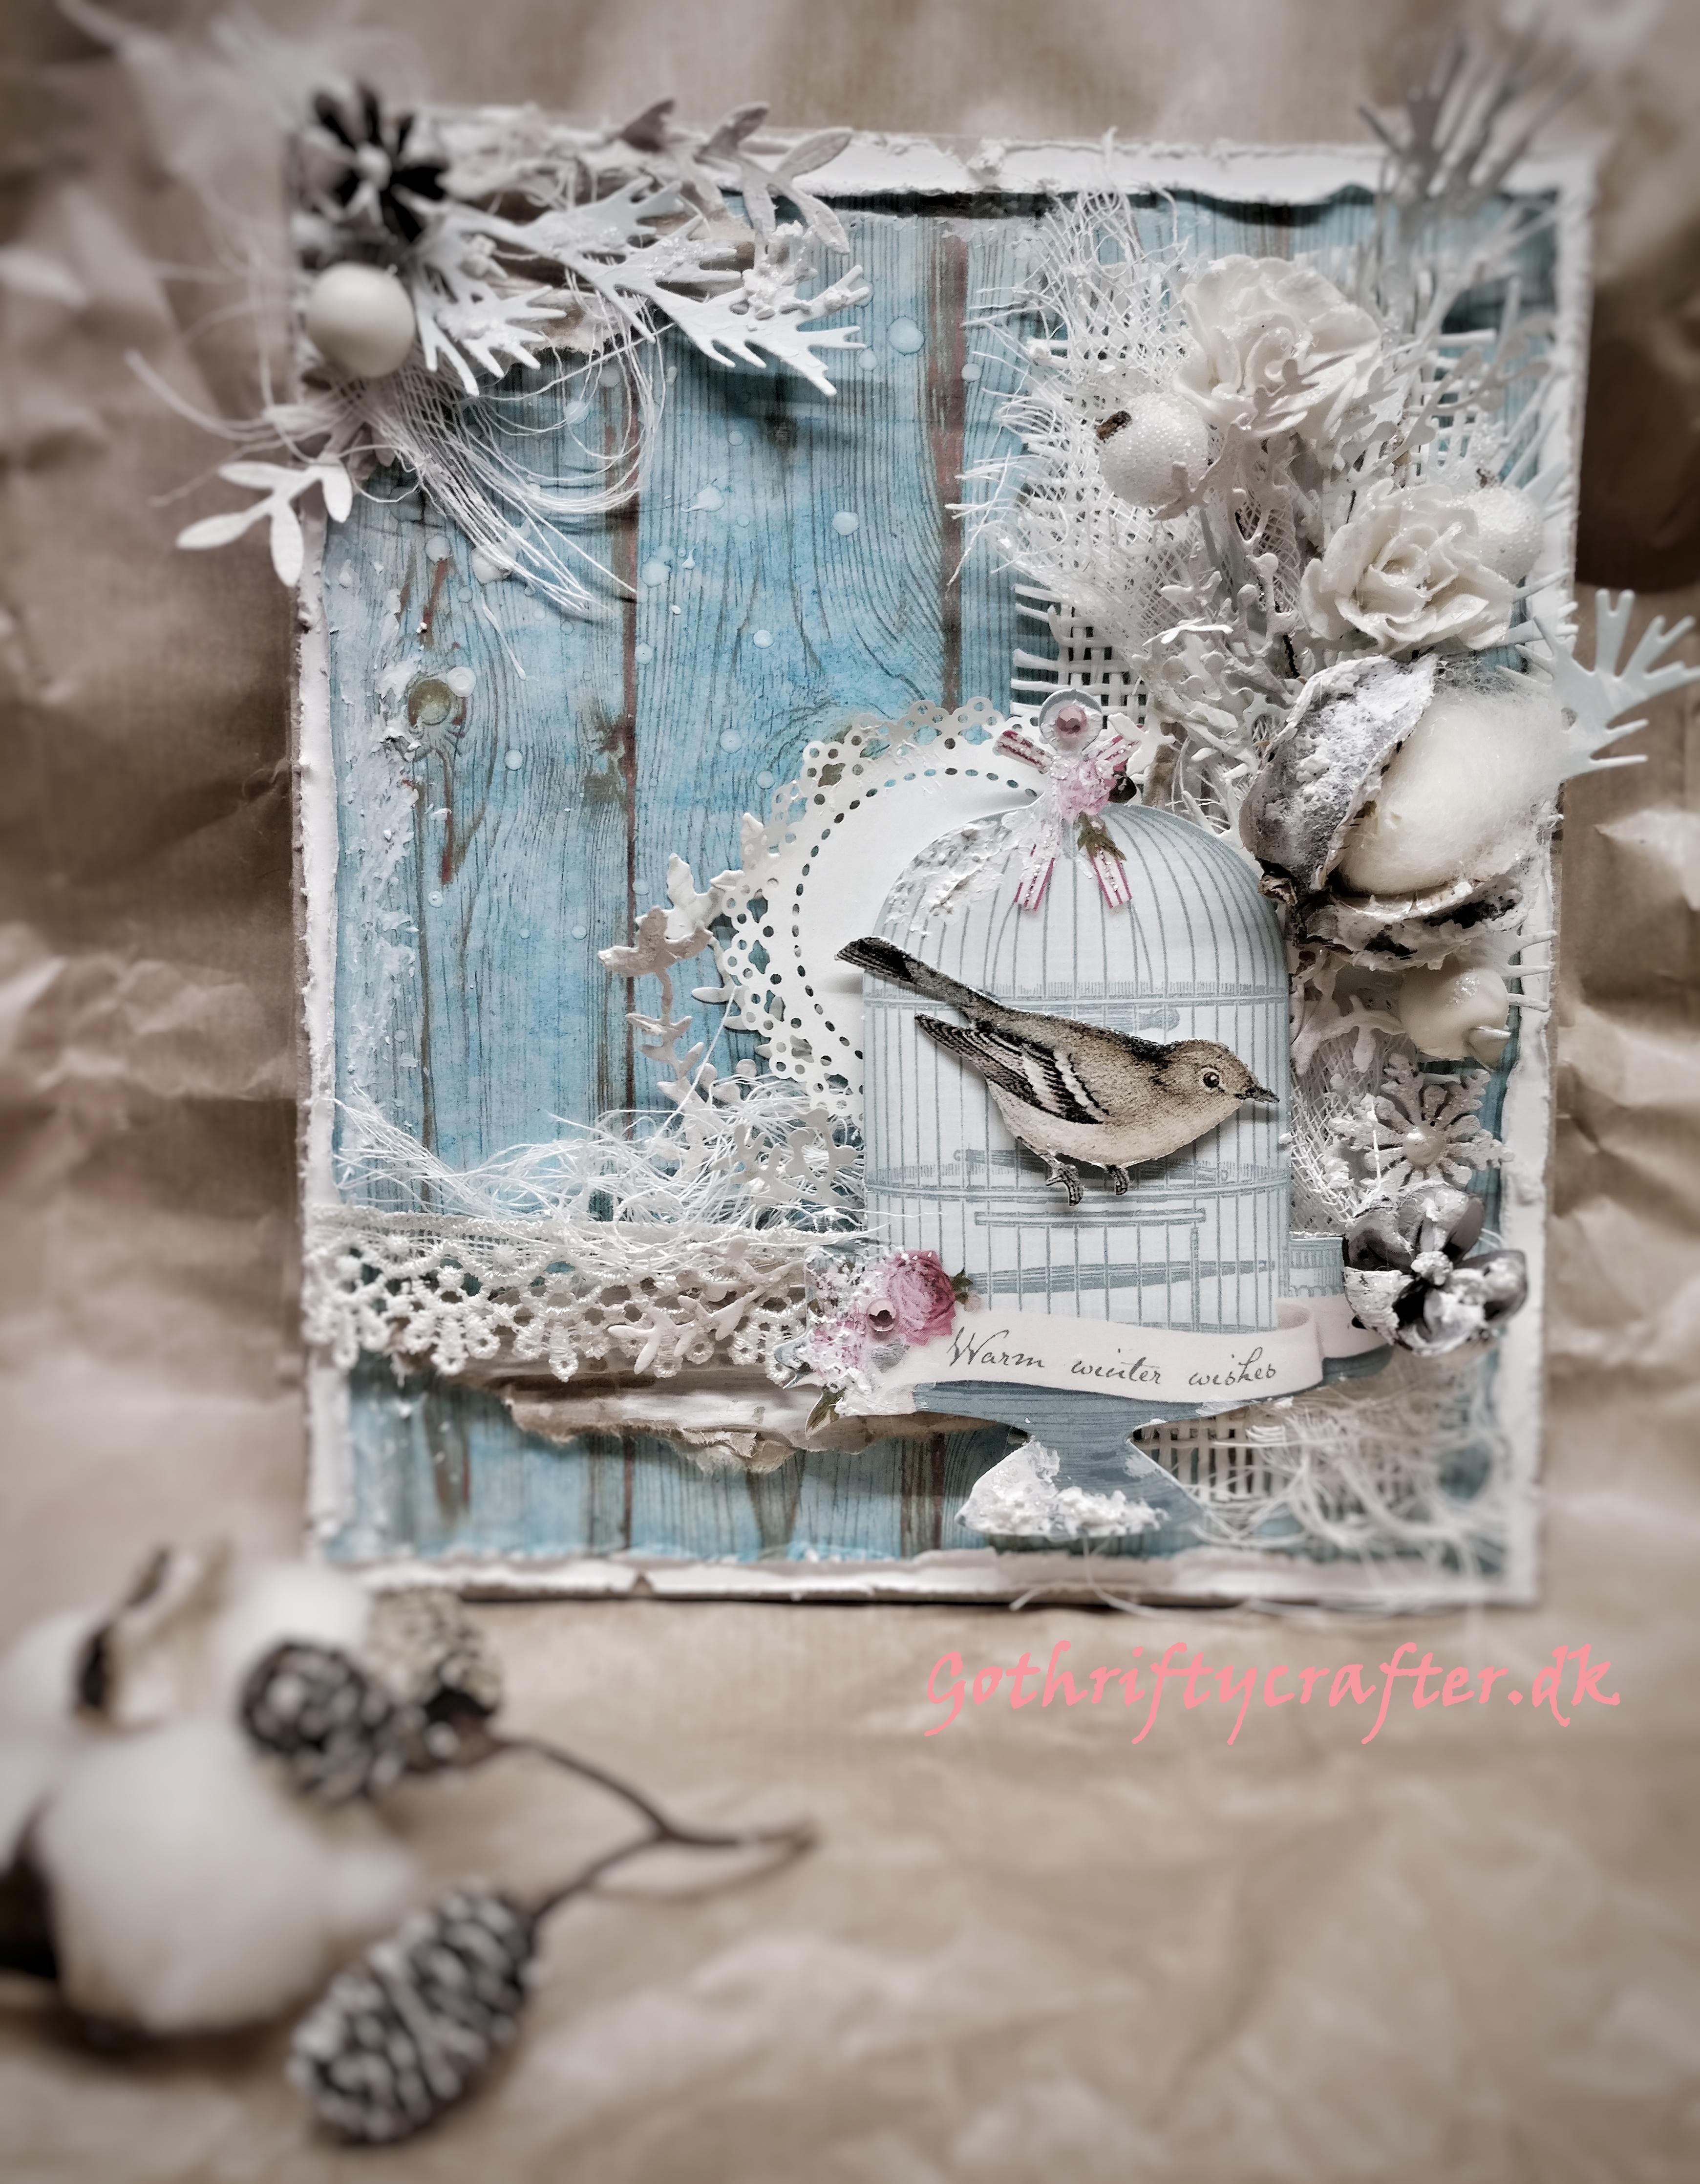 winterbirdscrapbookcardmixedmediajpg